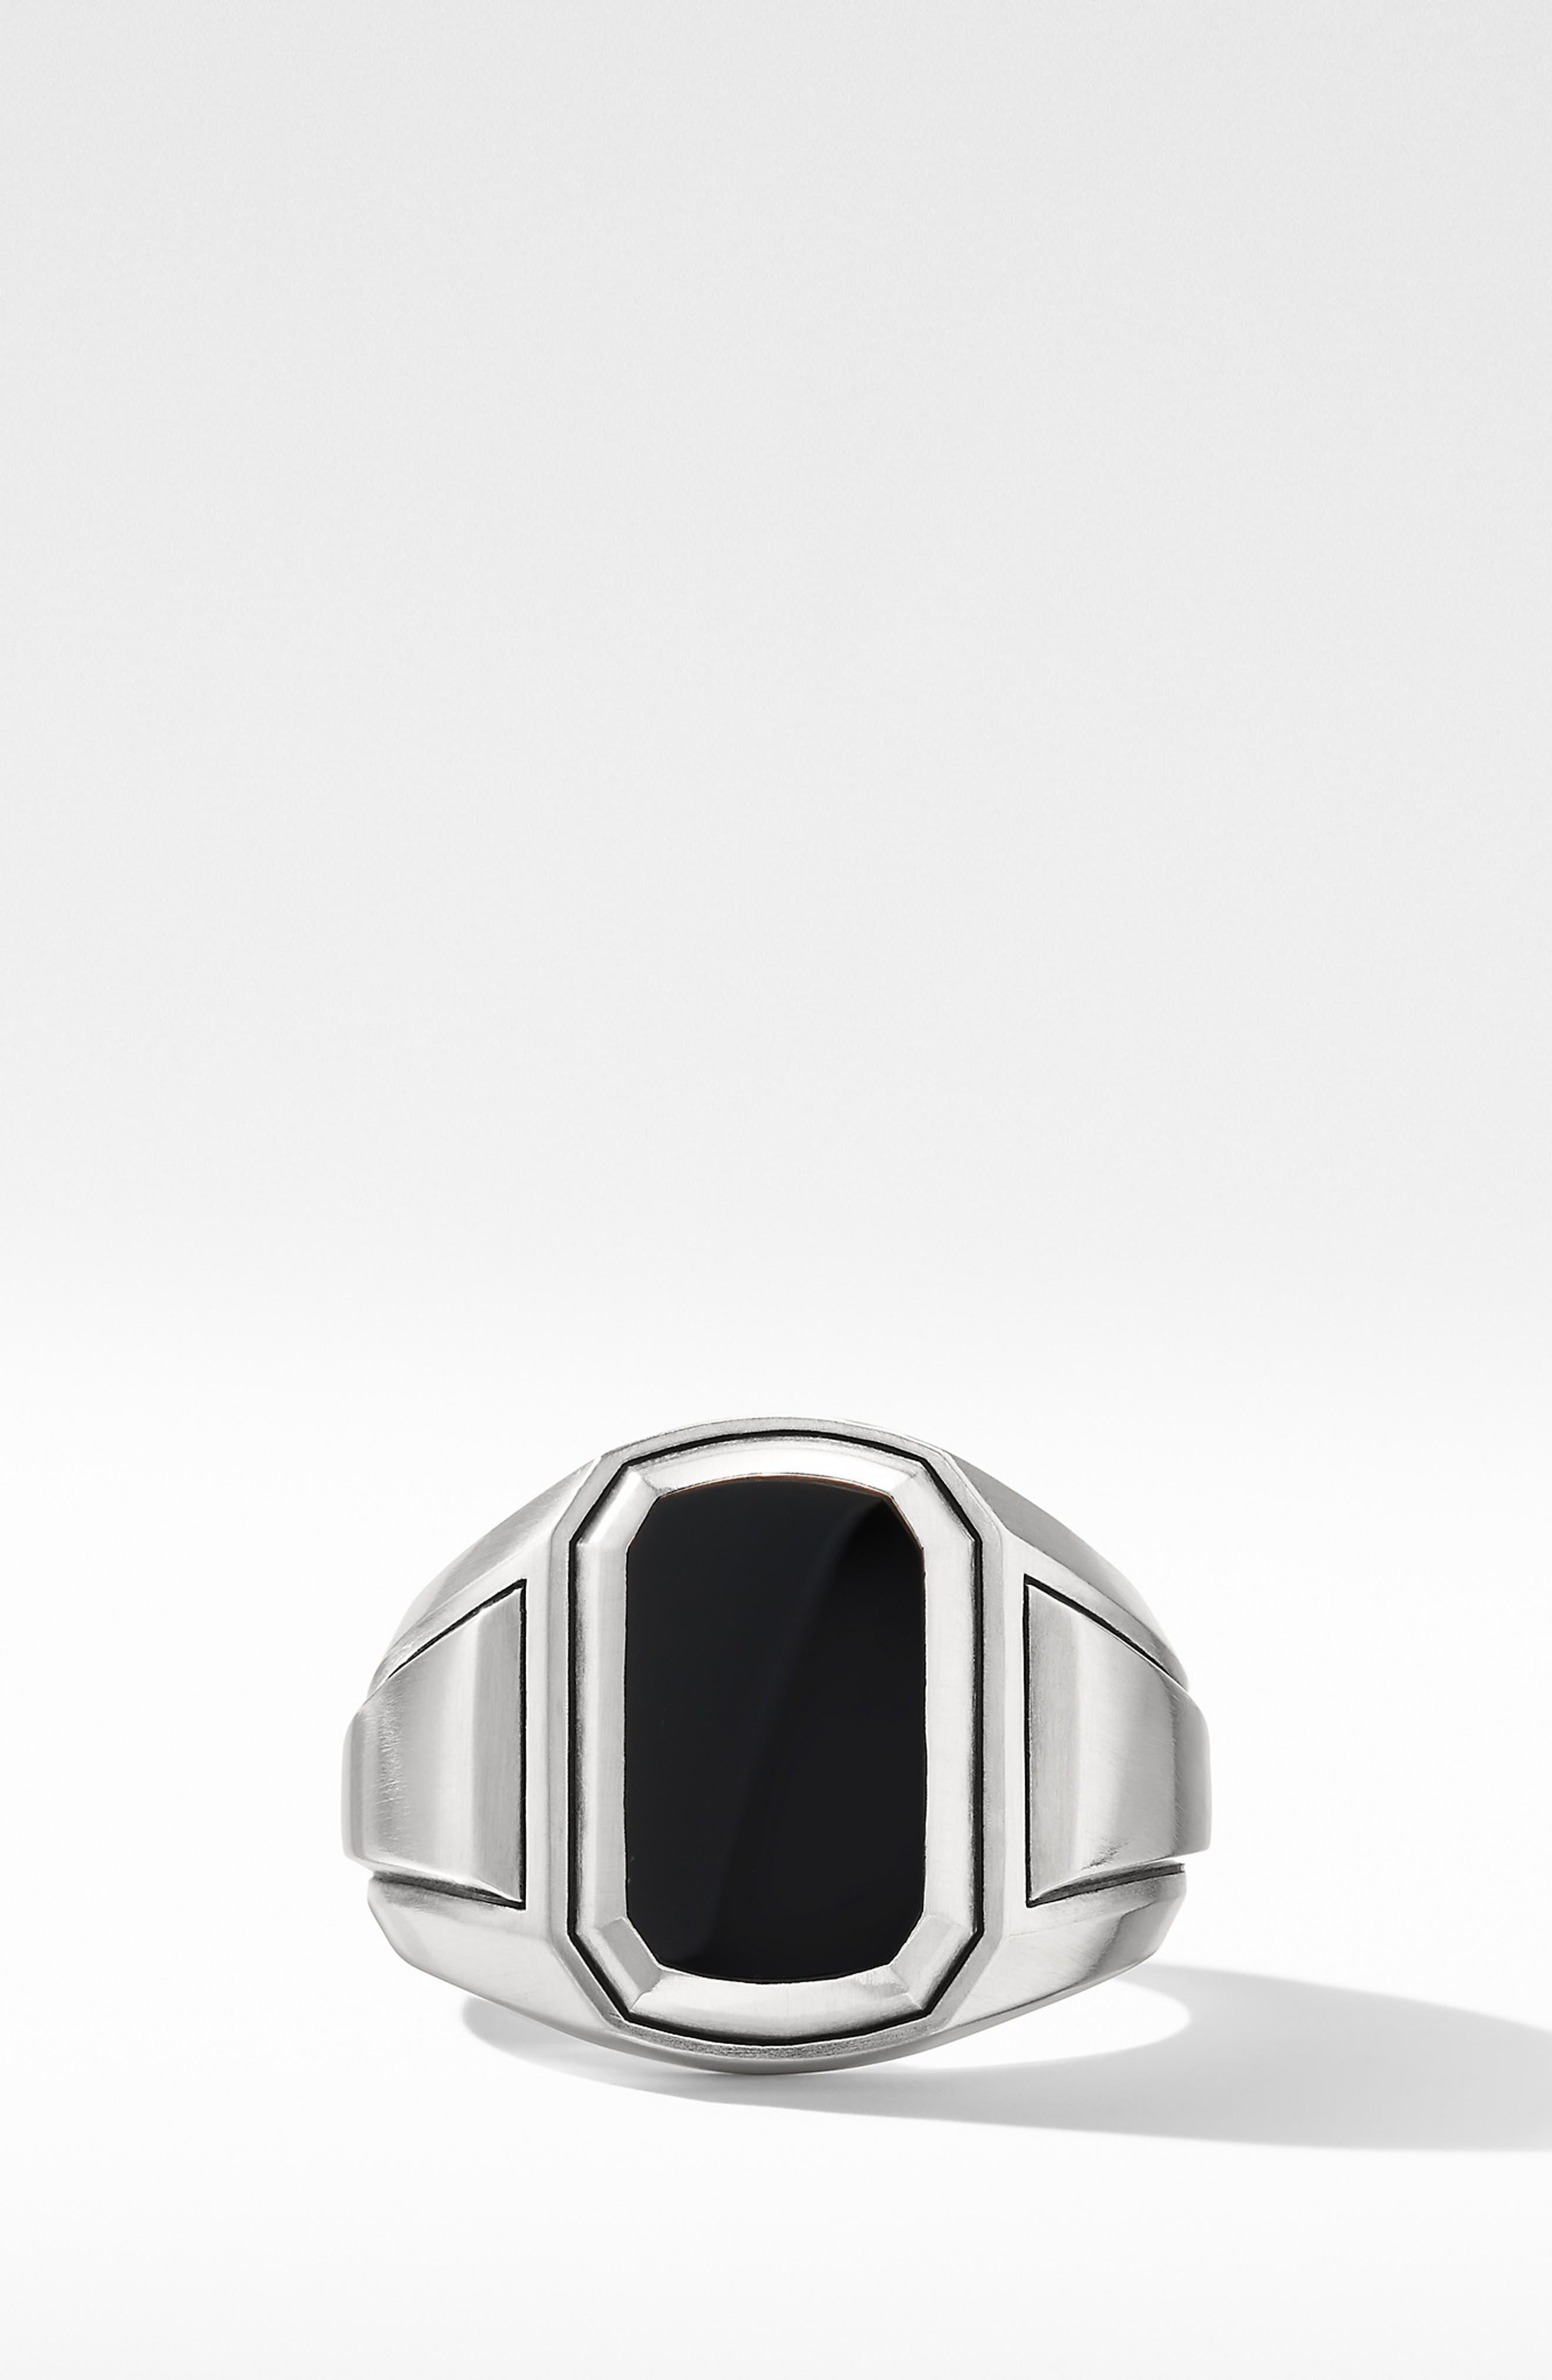 Deco Signet Ring with Black Onyx,                             Alternate thumbnail 3, color,                             BLACK ONYX